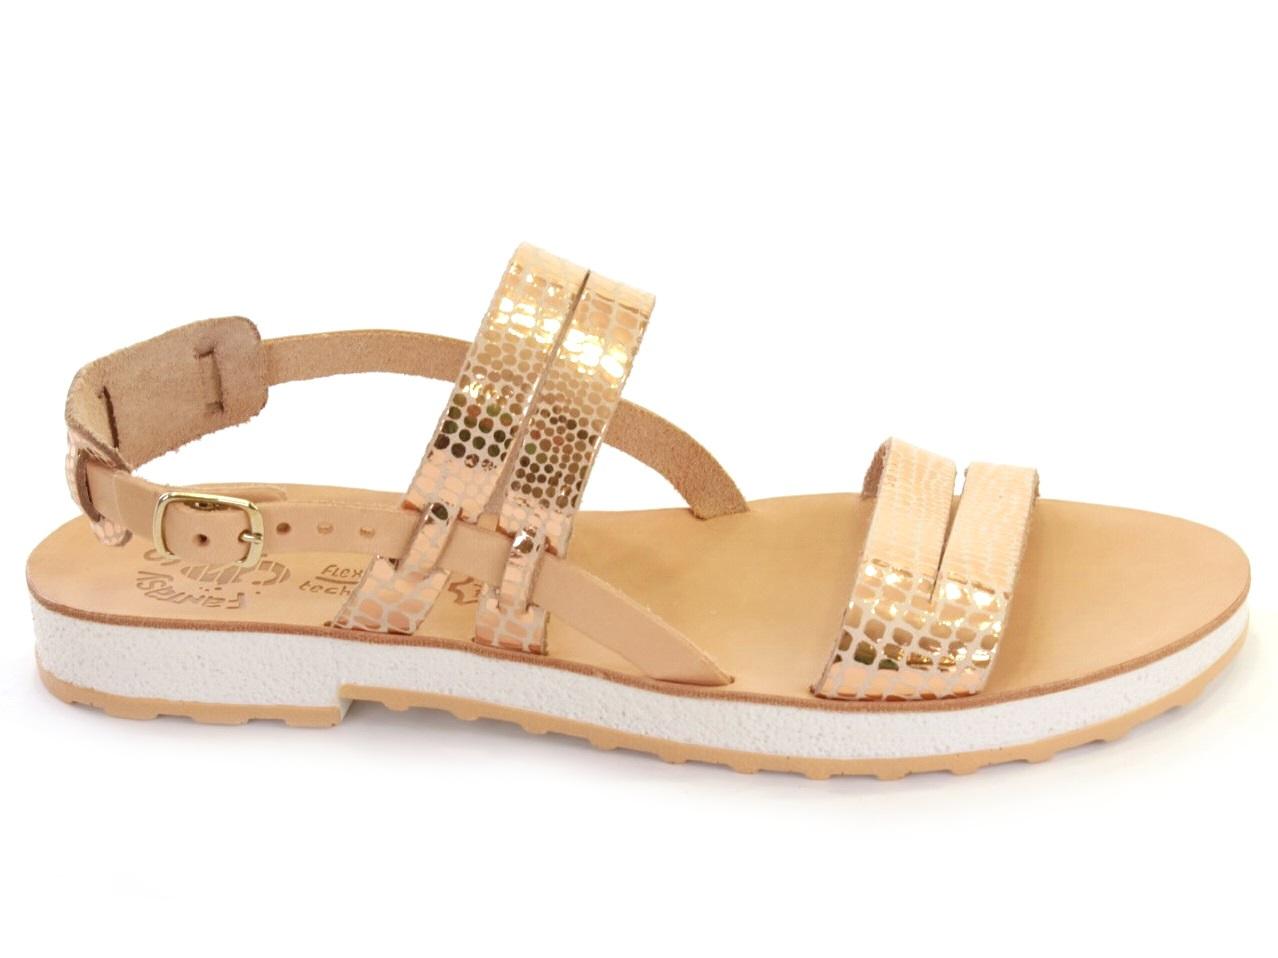 Sandálias Baixas Fantasy Sandals - 662 SELENE S4003